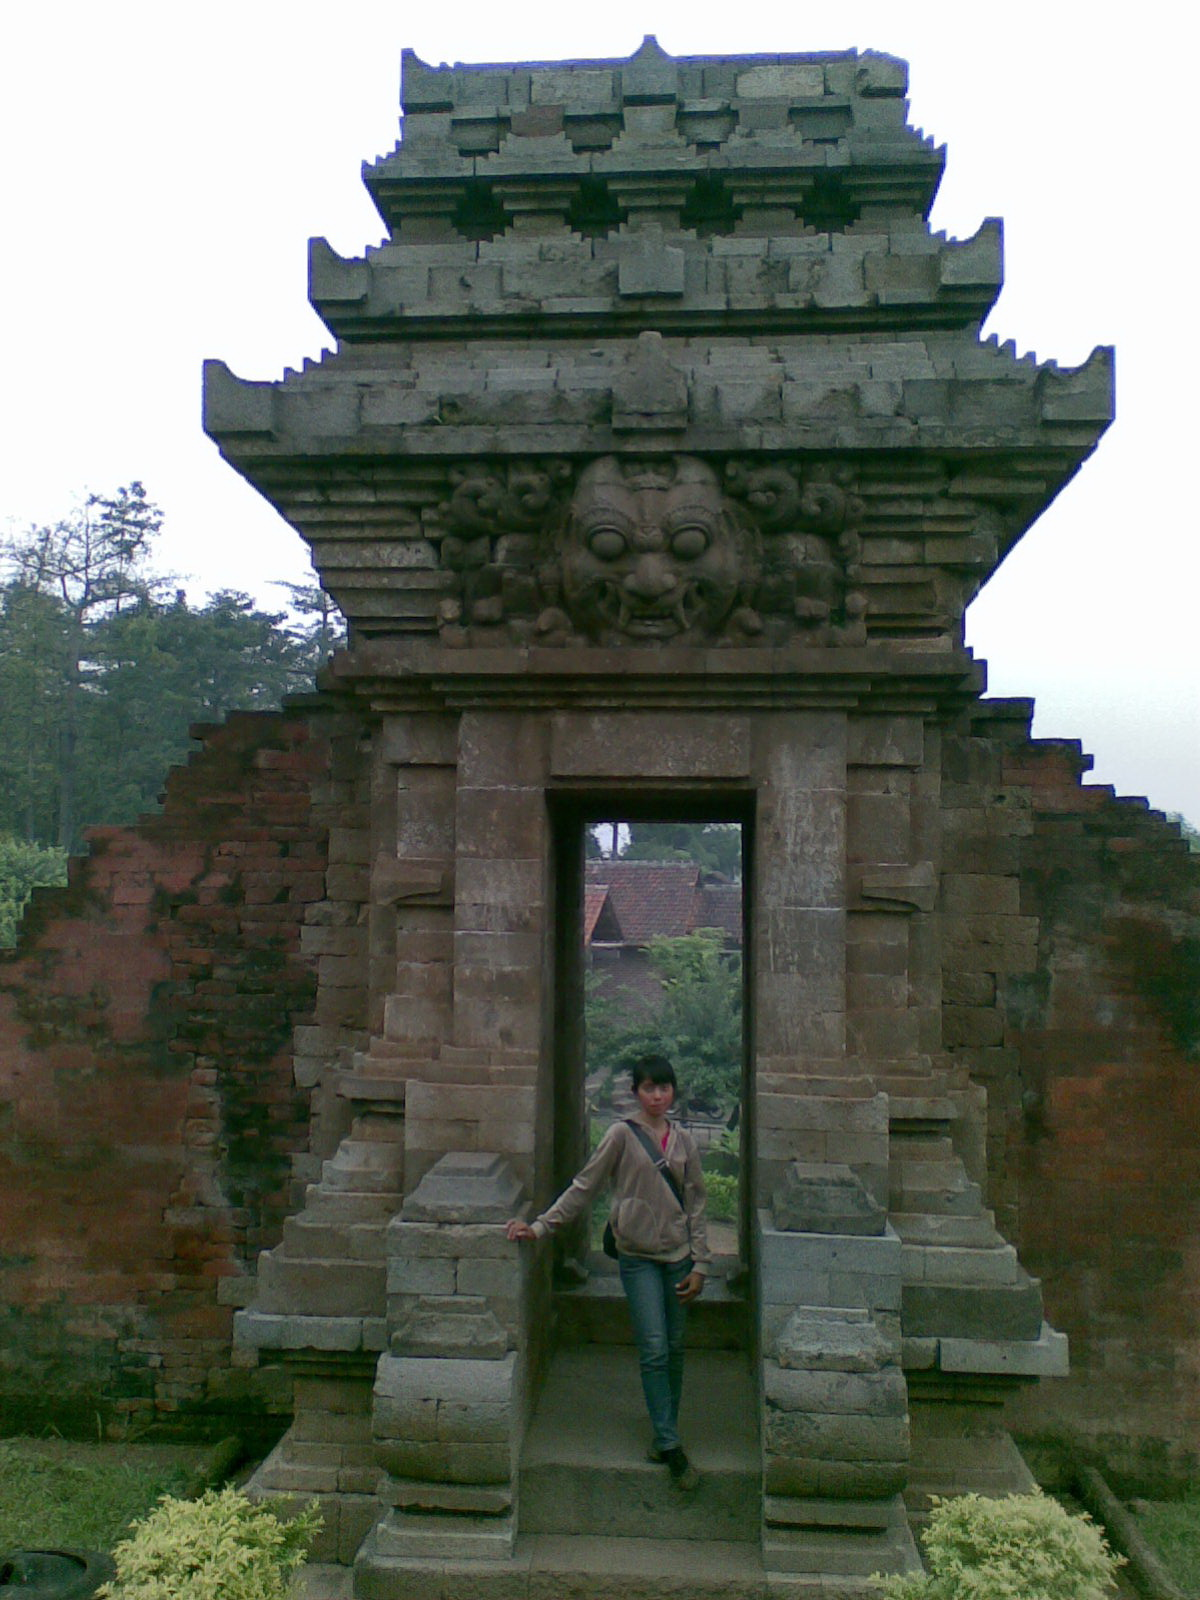 Petualangan Ali Topan Candi Jedong Peninggalan Kerajaan Majapahit Gapura Kedua